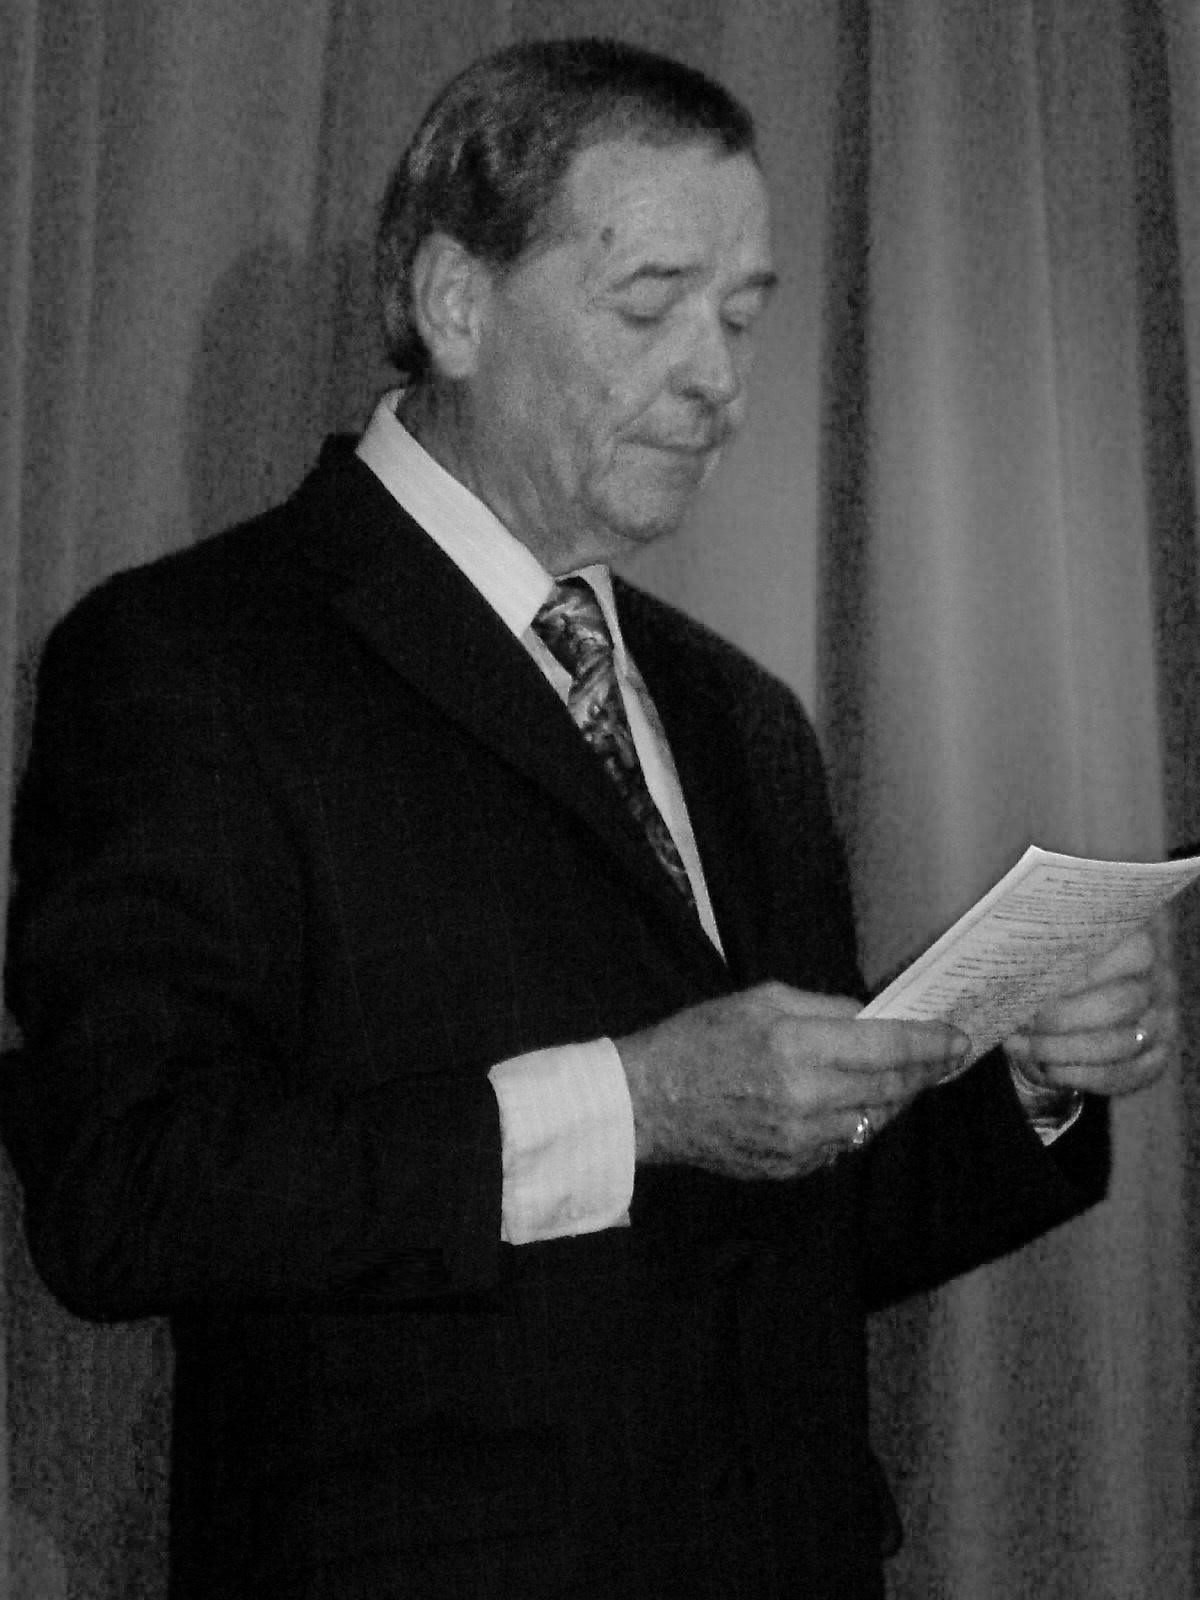 Bobby K. Cox